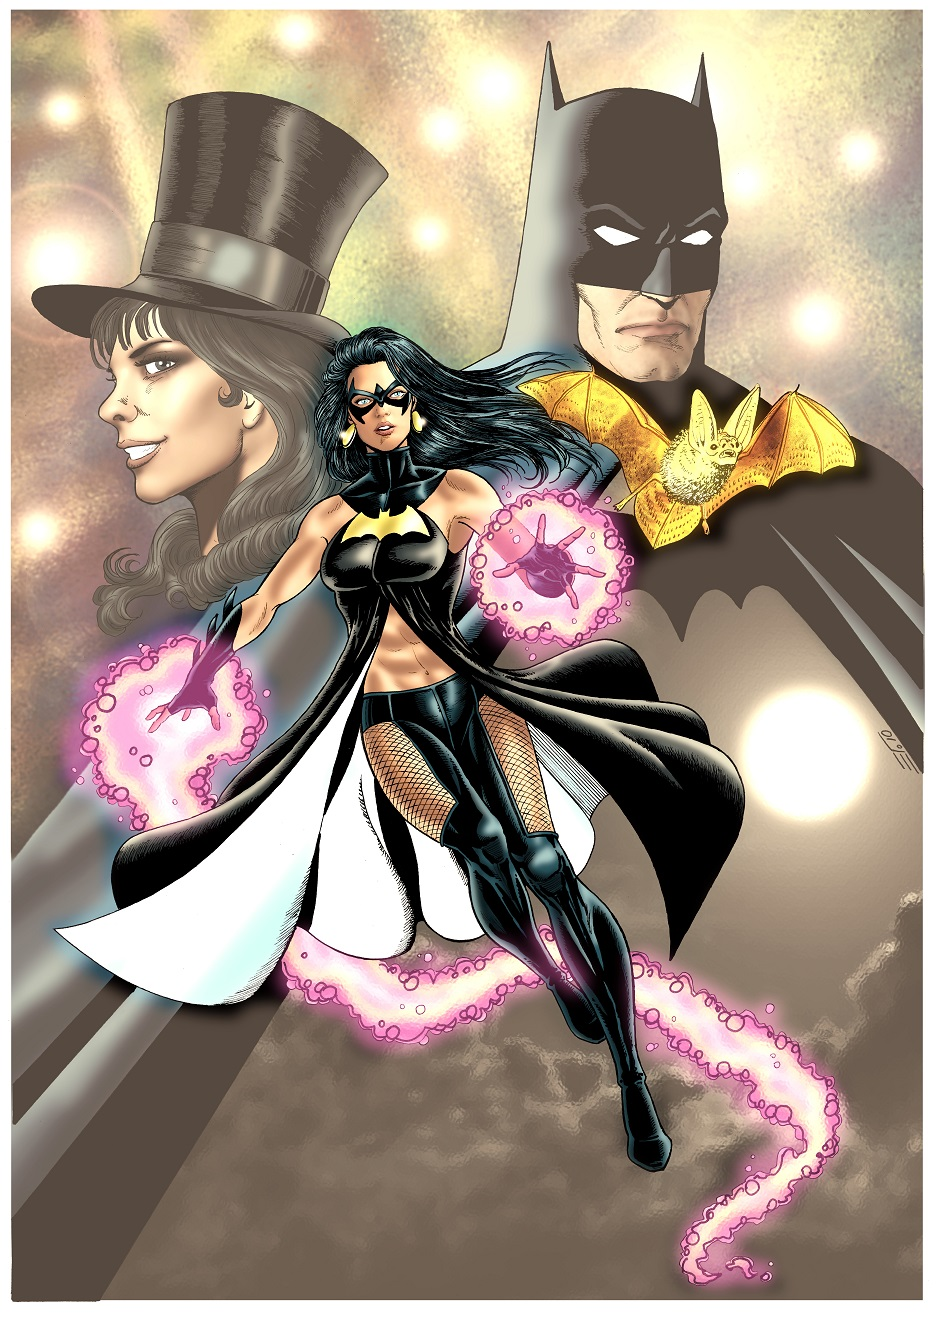 ALEX GARCIA: BATGIRL: the daughter of Zatanna and Batman